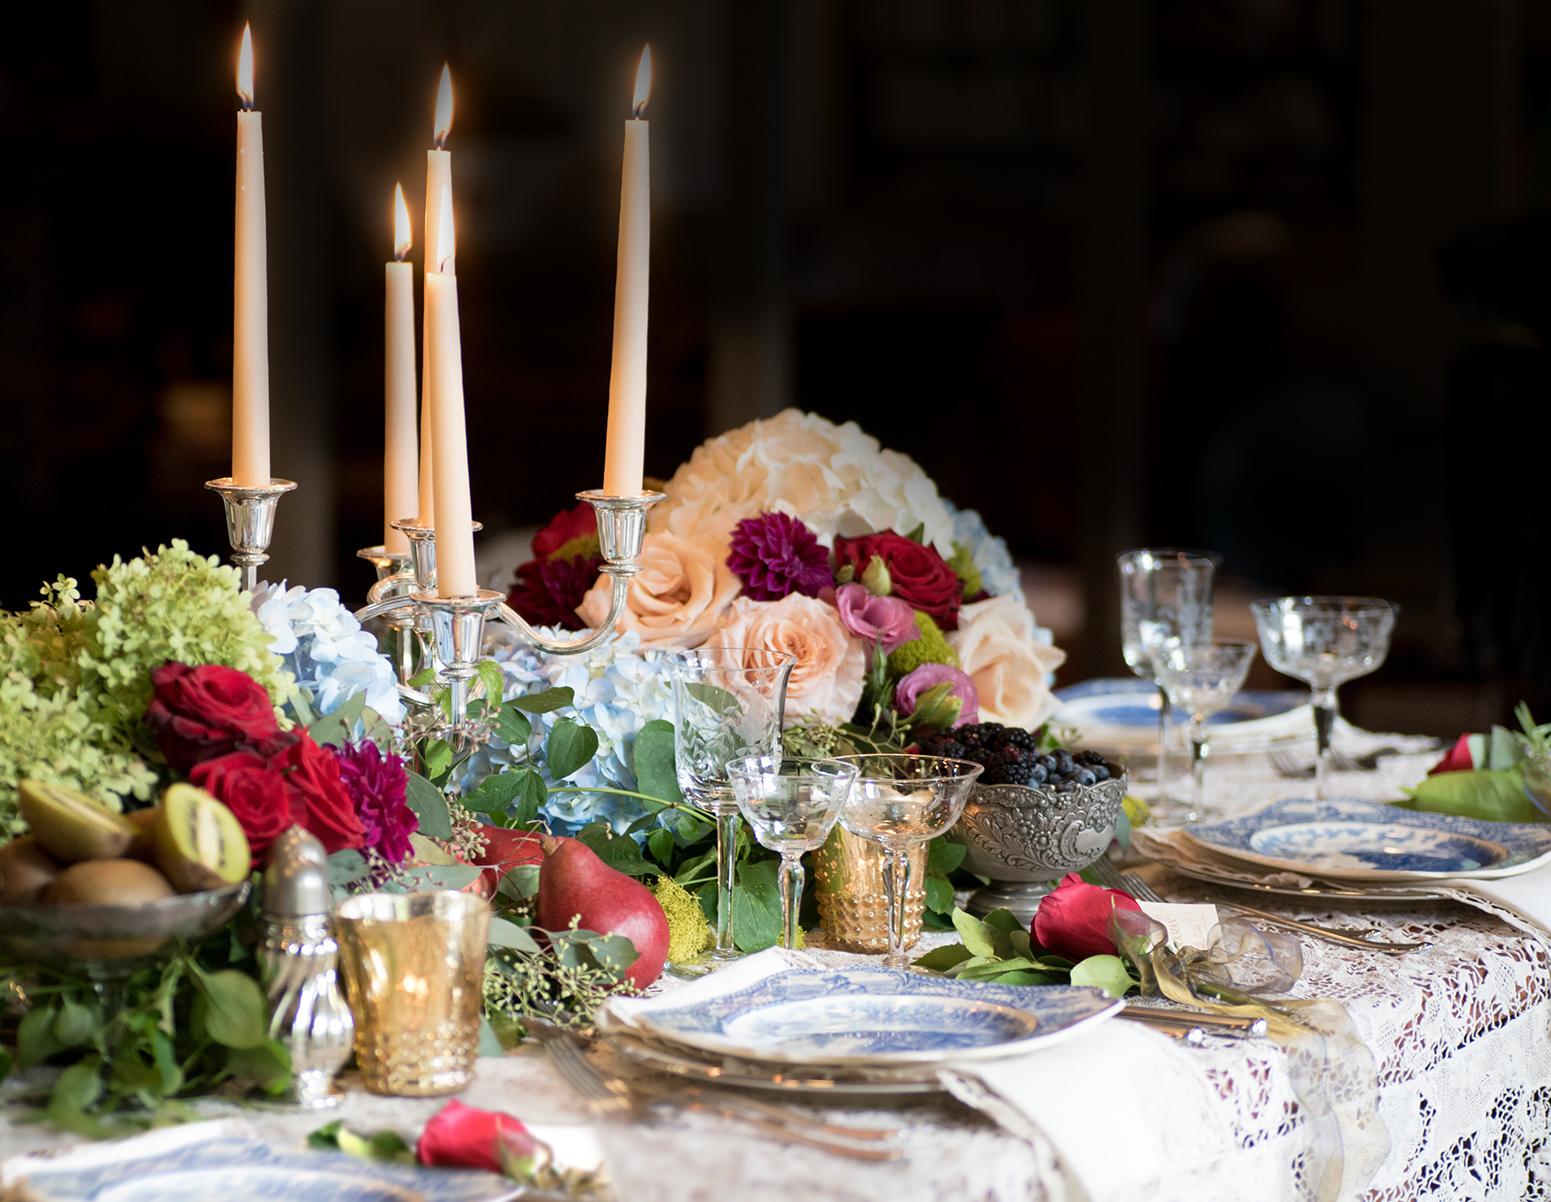 event-design-table-setting-fruit-place settings.jpg